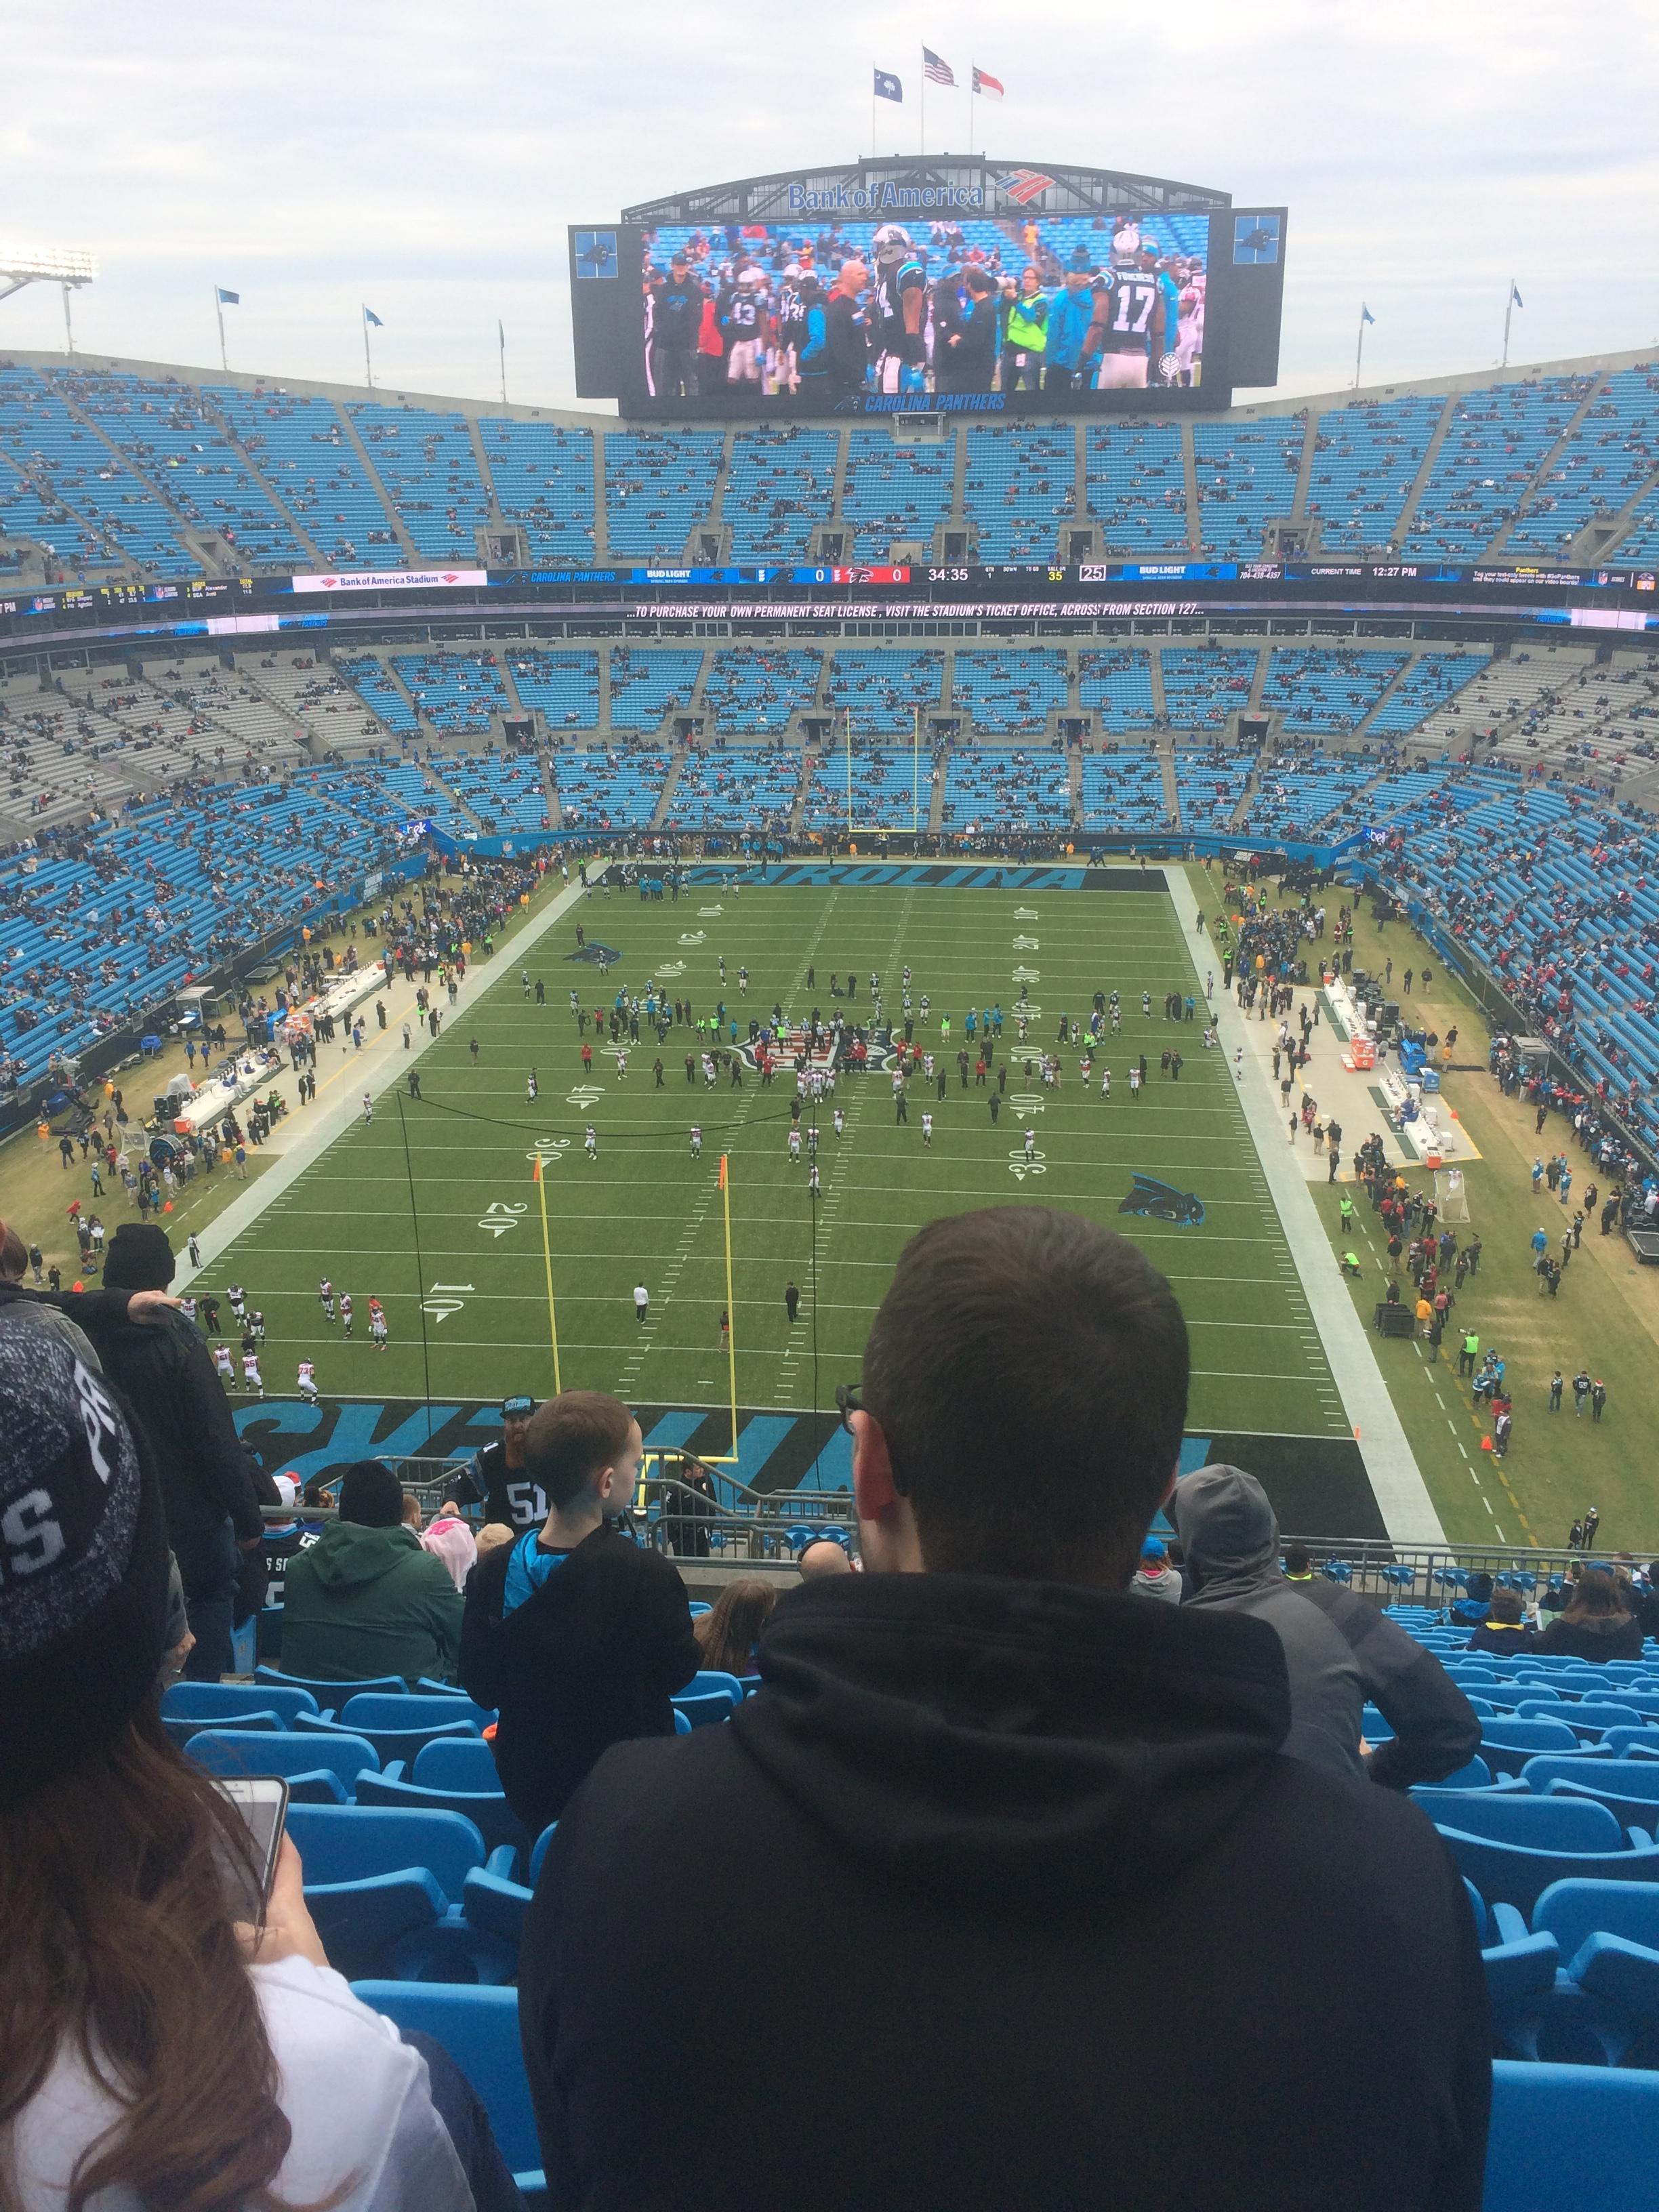 Bank of America Stadium Section 527 Row 17 Seat 21